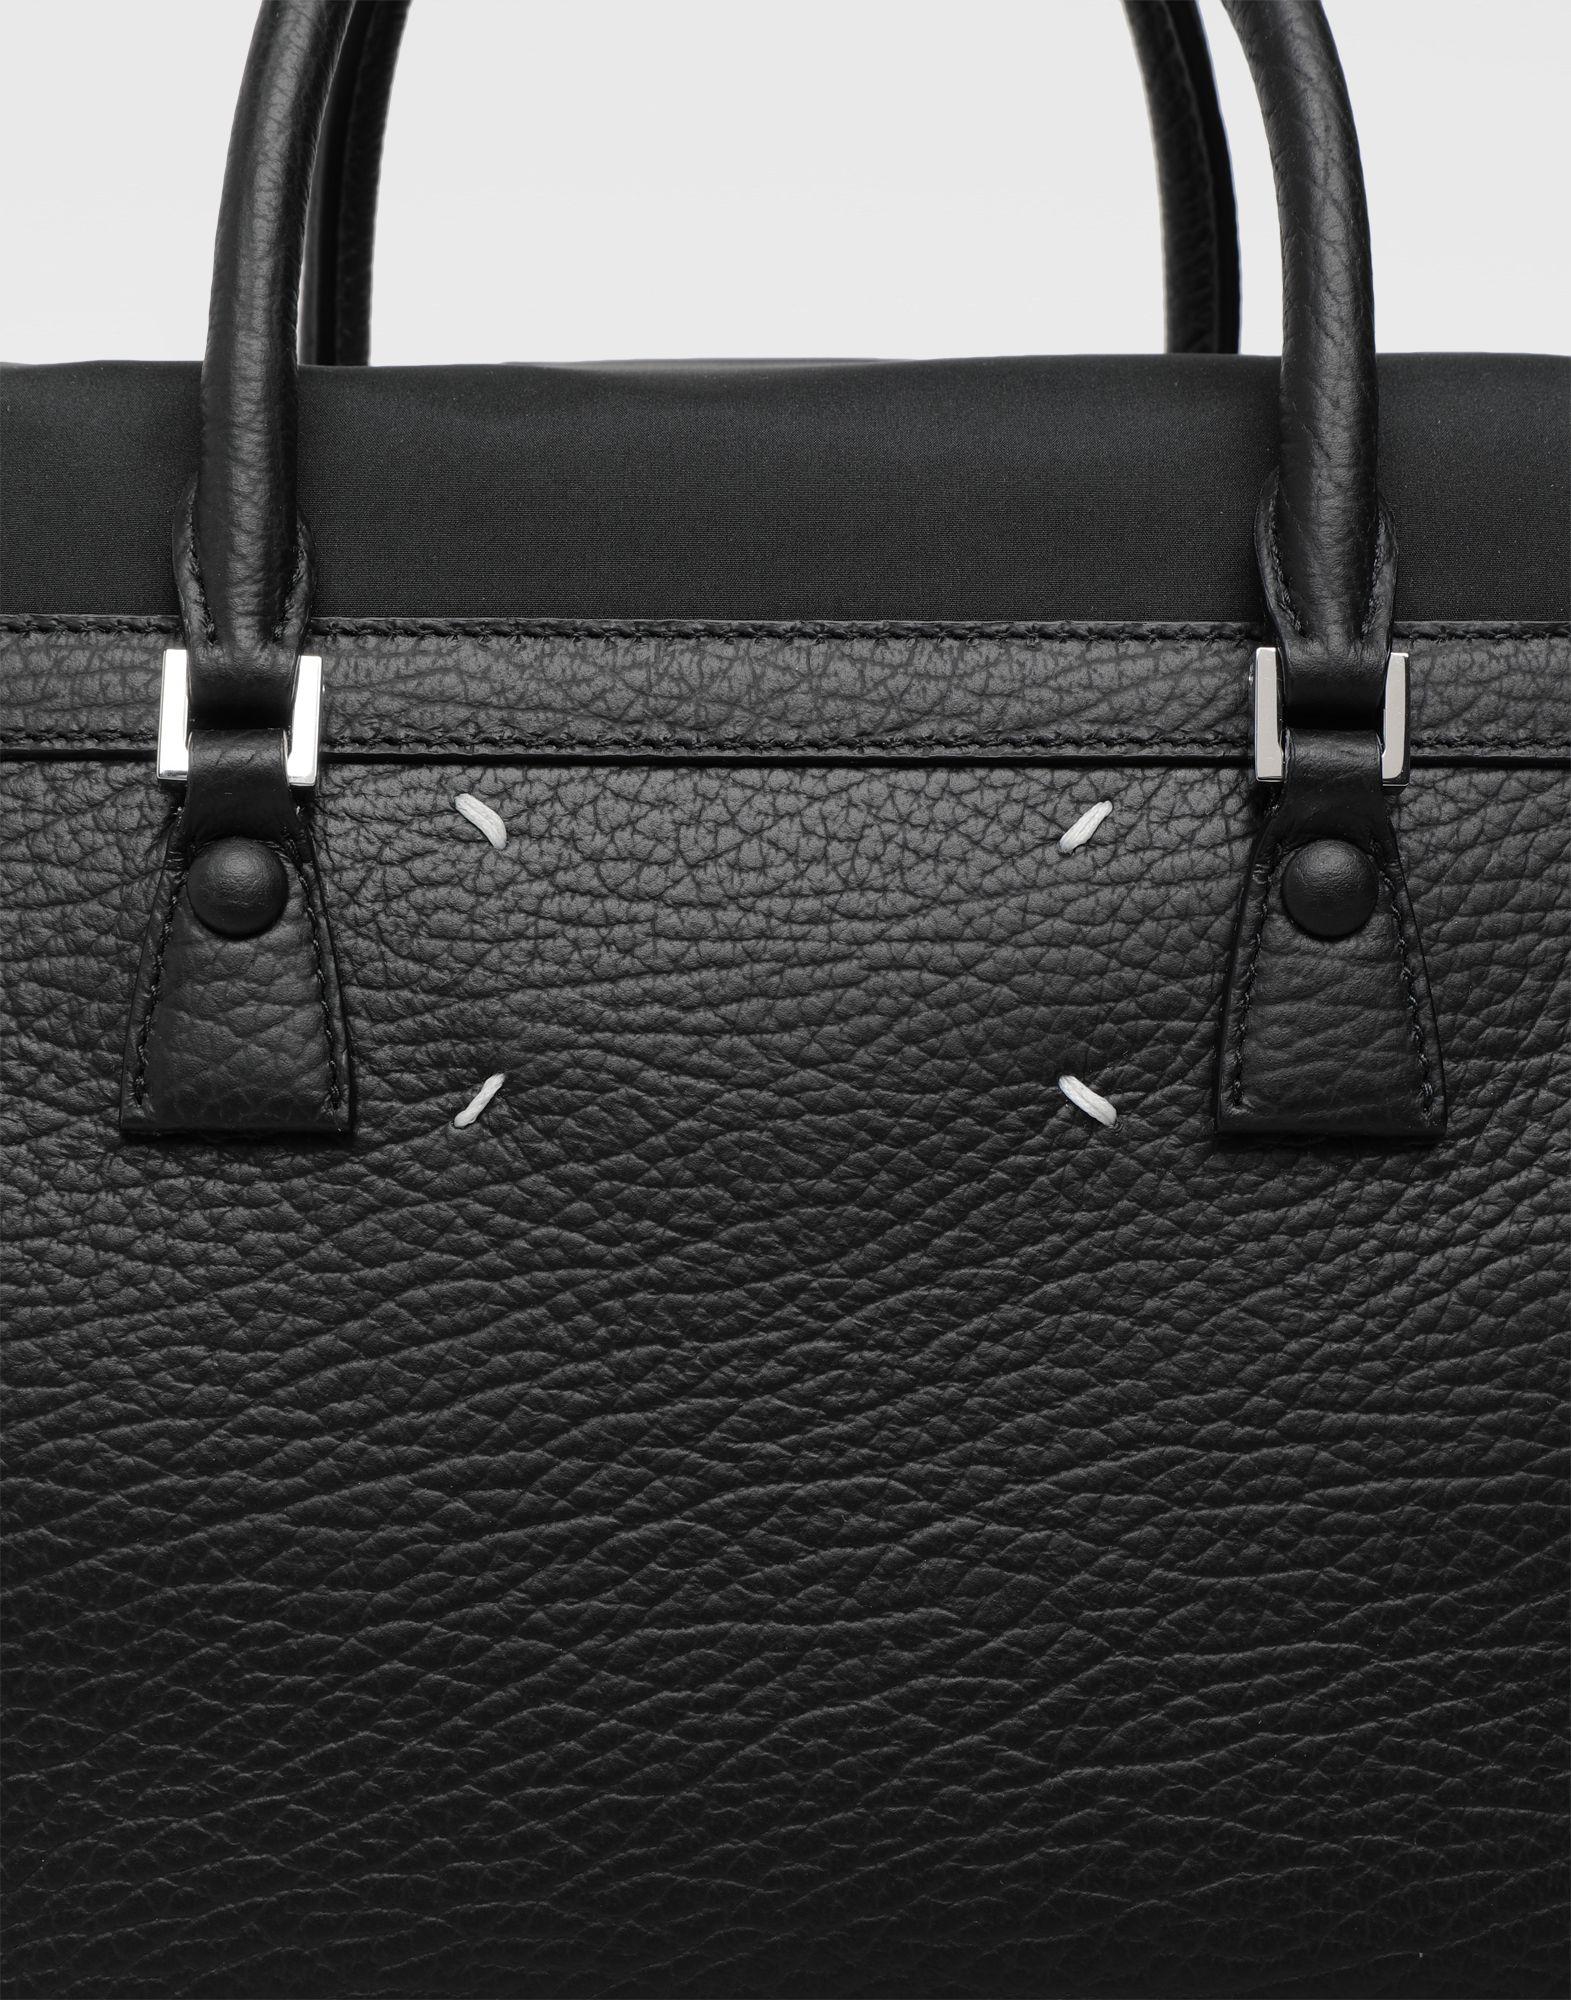 MAISON MARGIELA 5AC 3-pockets bag Handbag Woman b